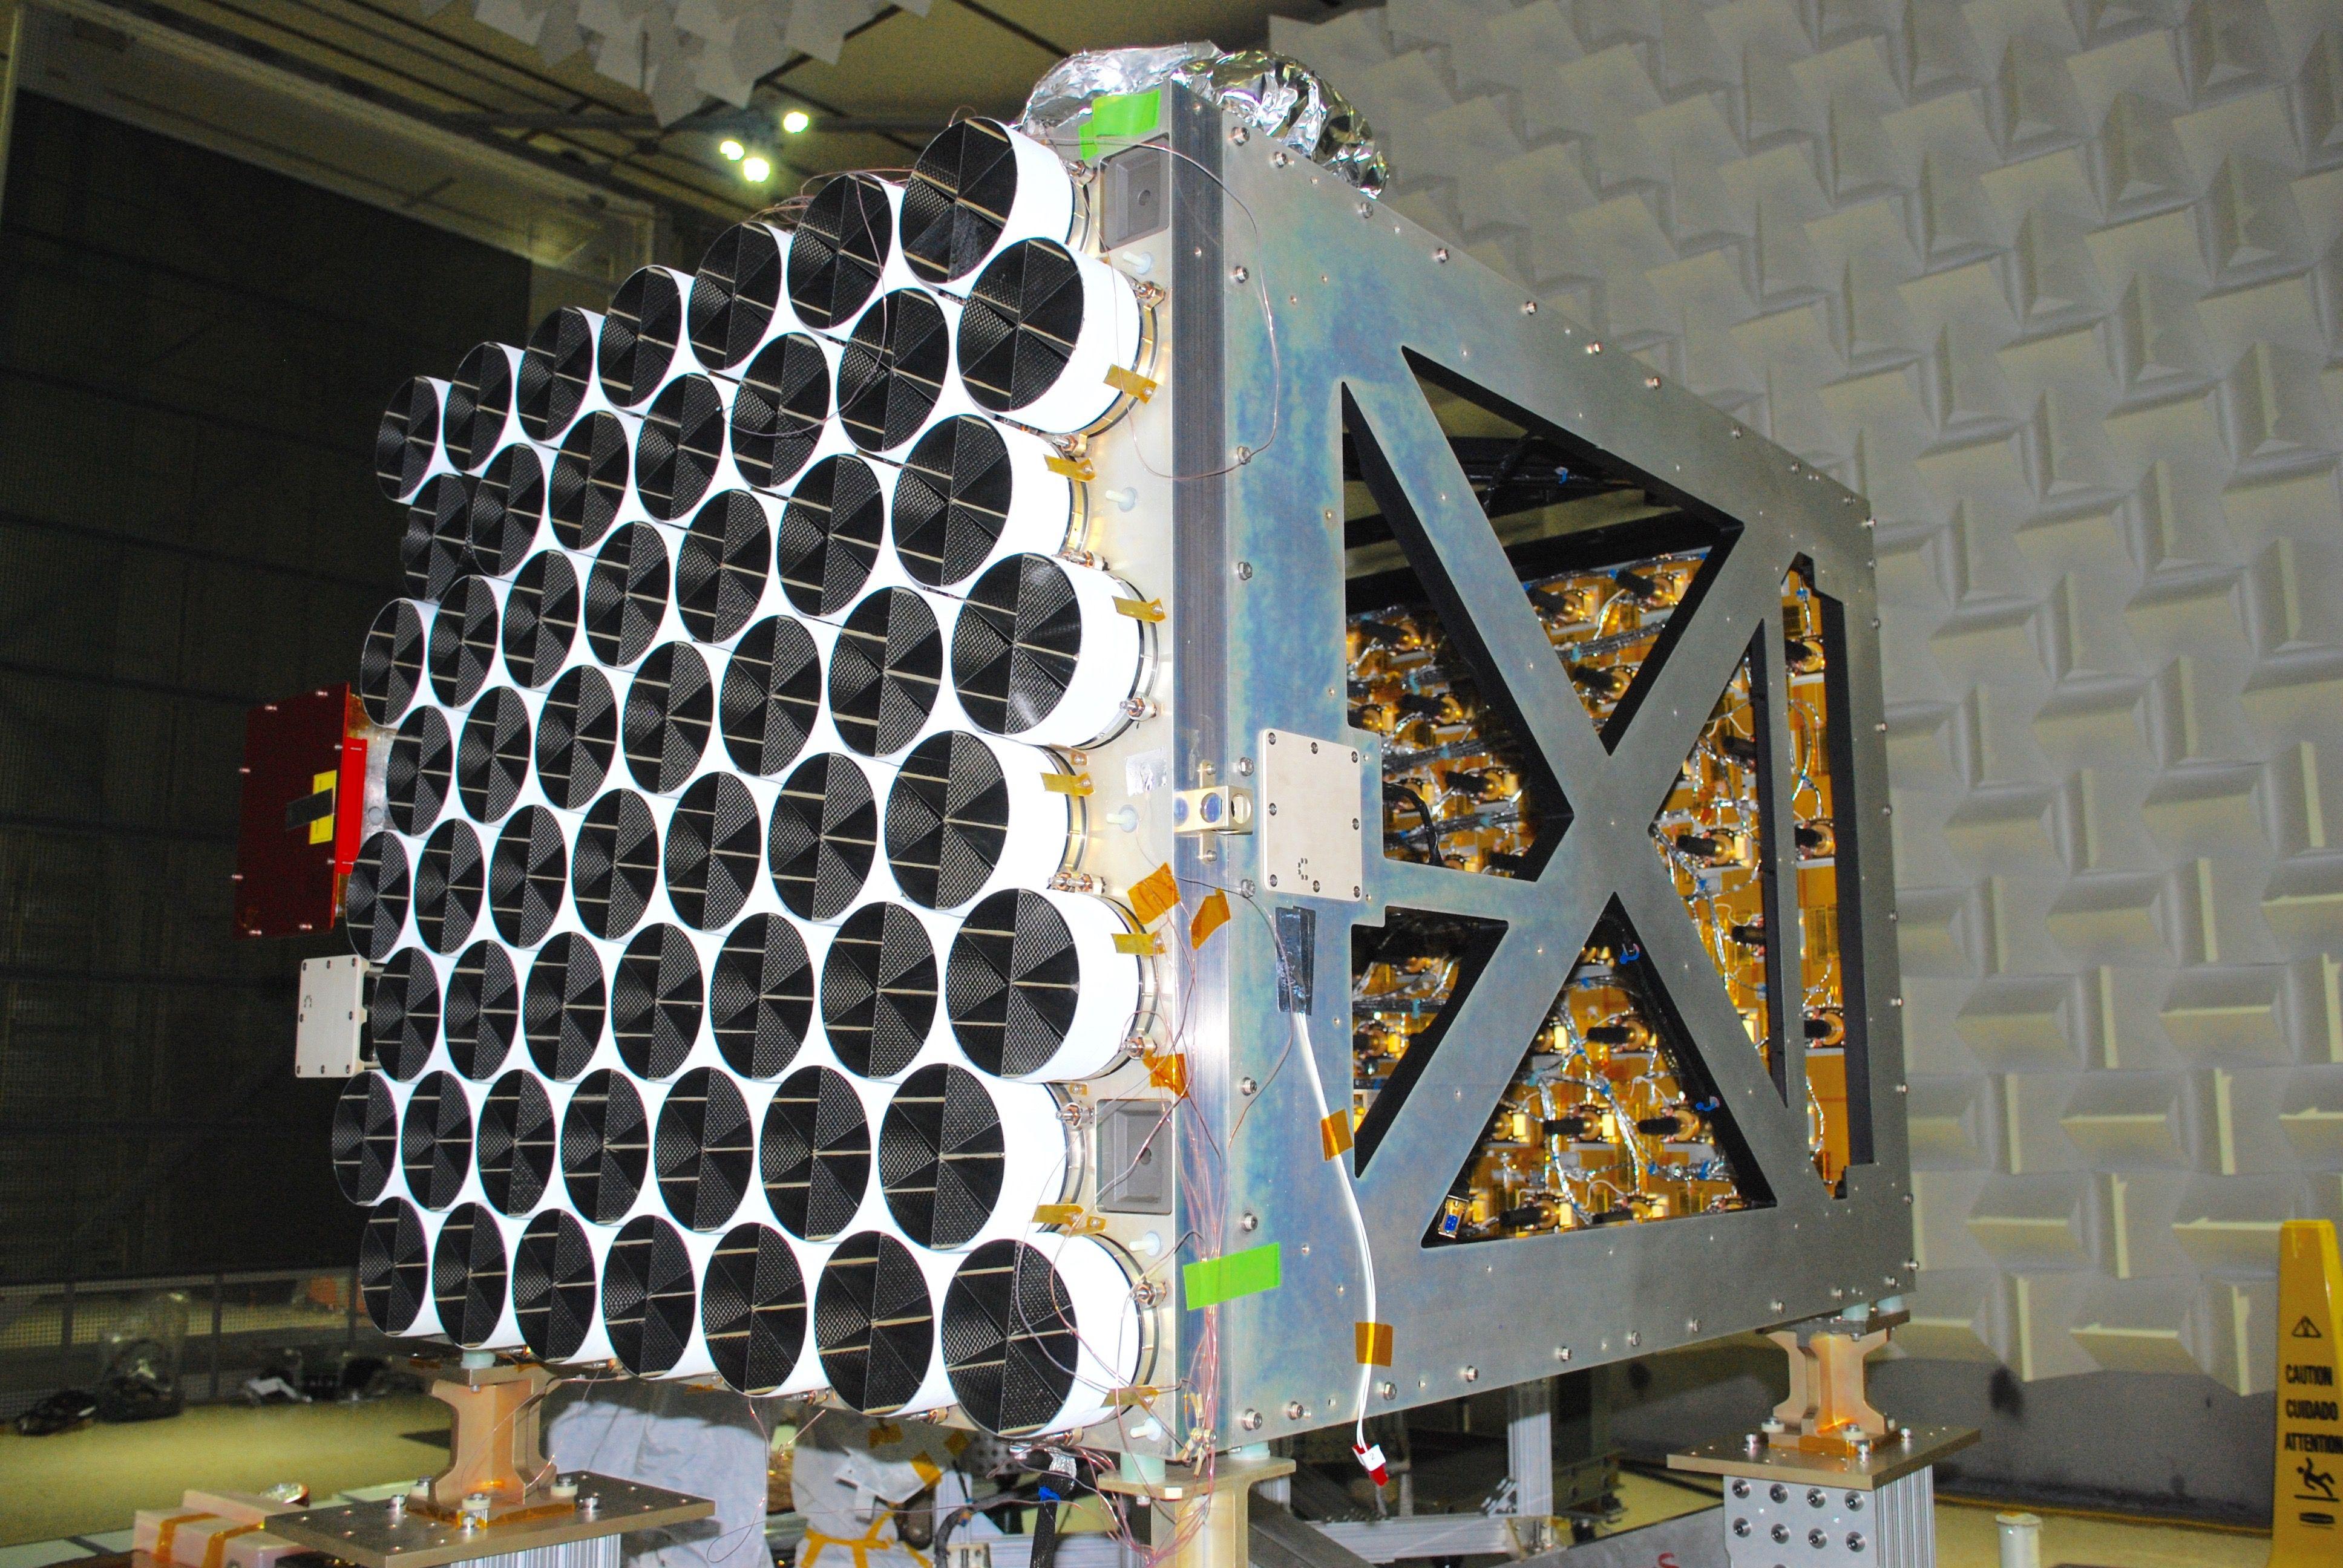 ISS To Get Instrument To Study Neutron Stars